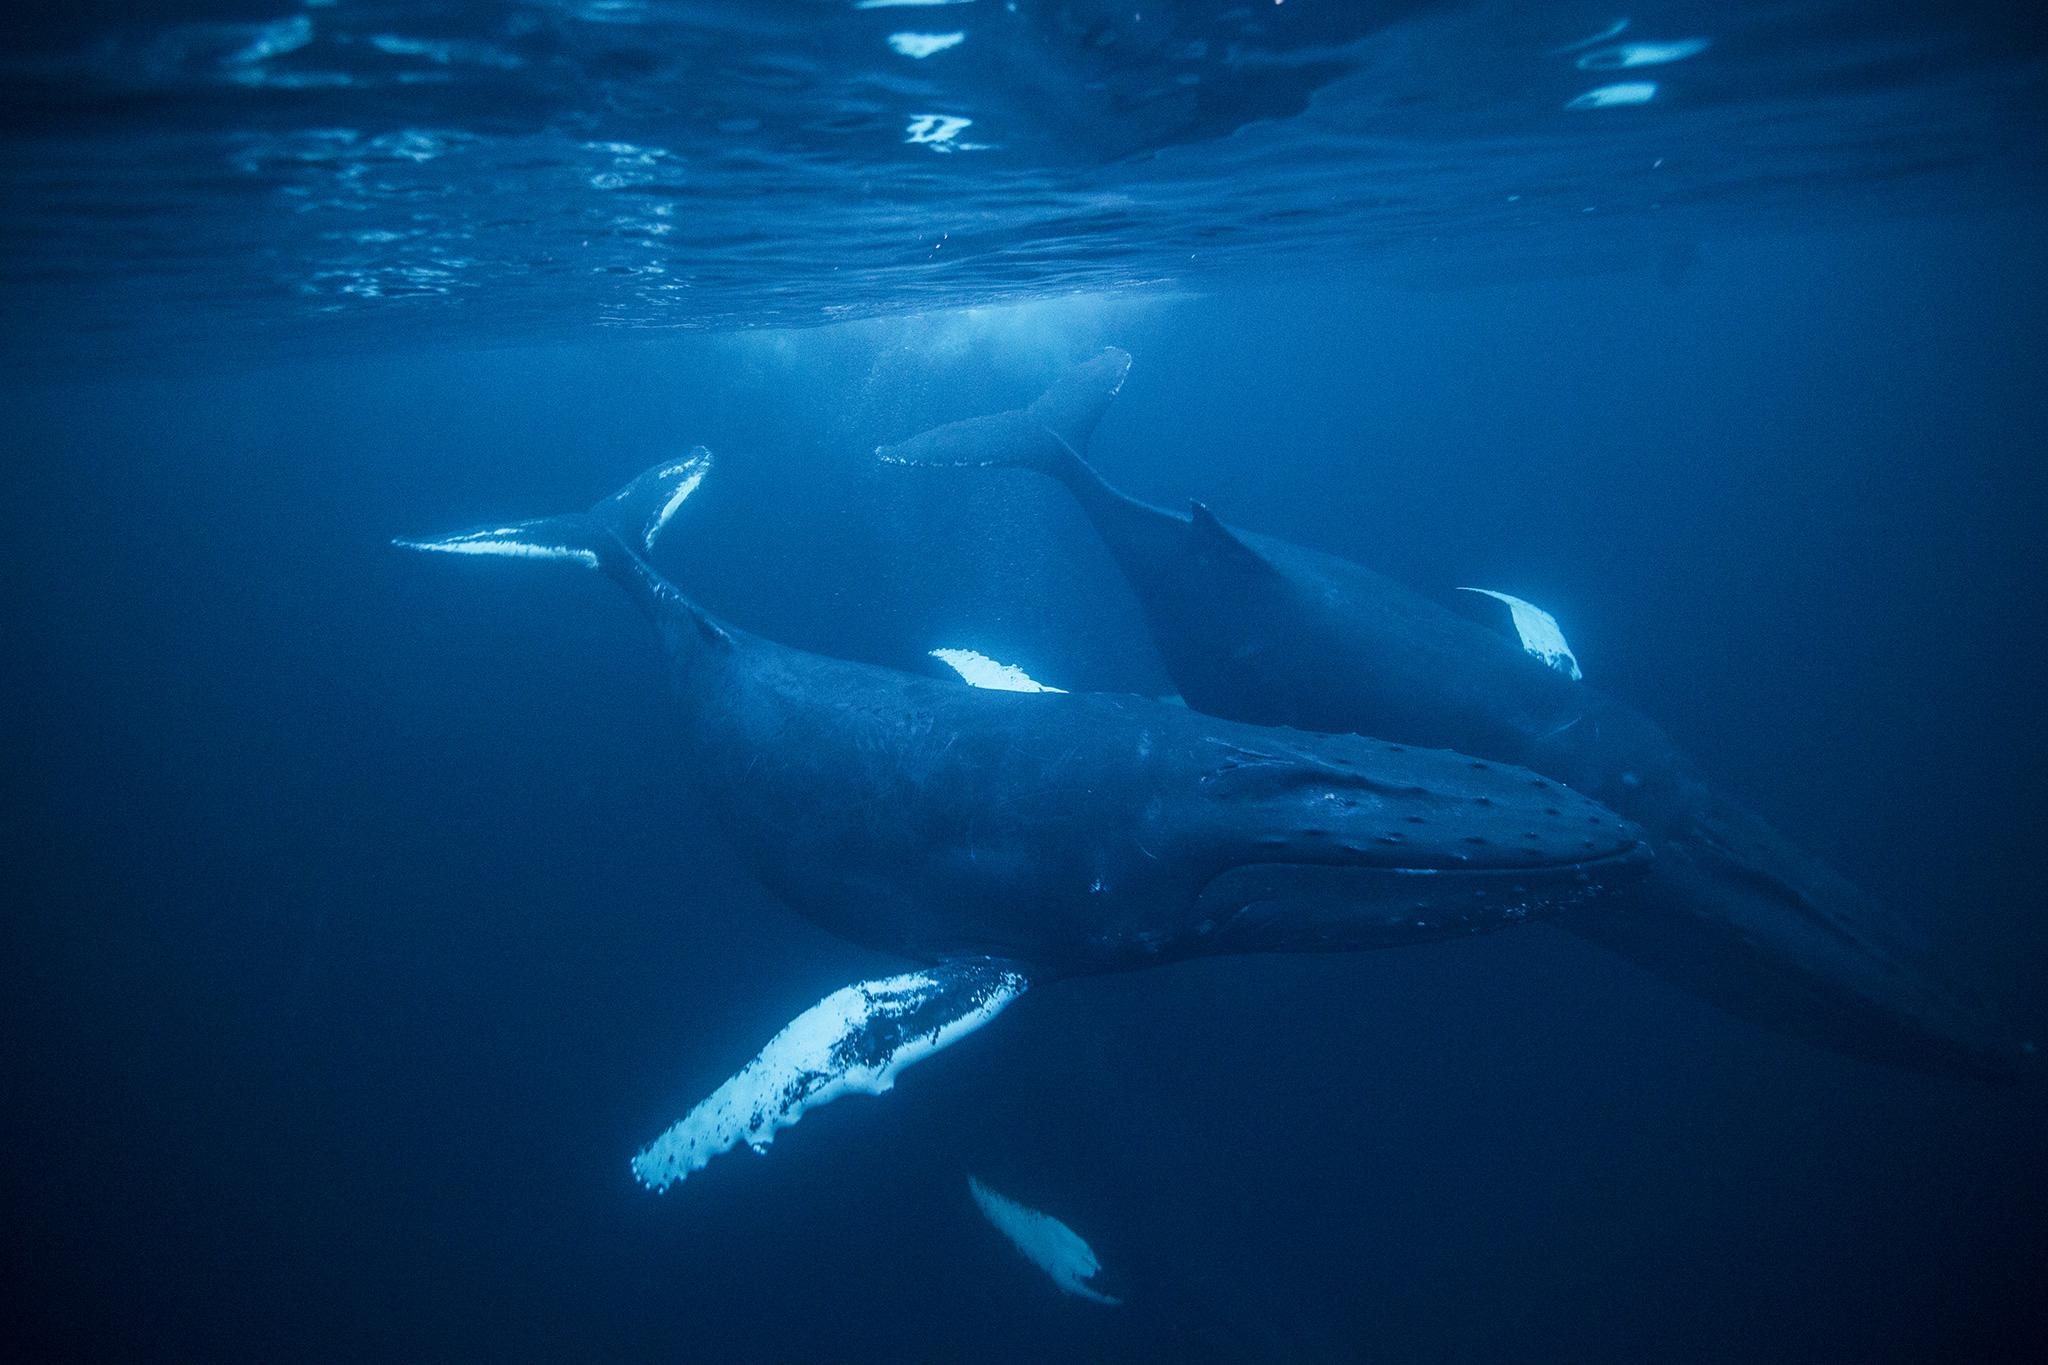 Humpback Whale HD wallpapers, Desktop wallpaper - most viewed